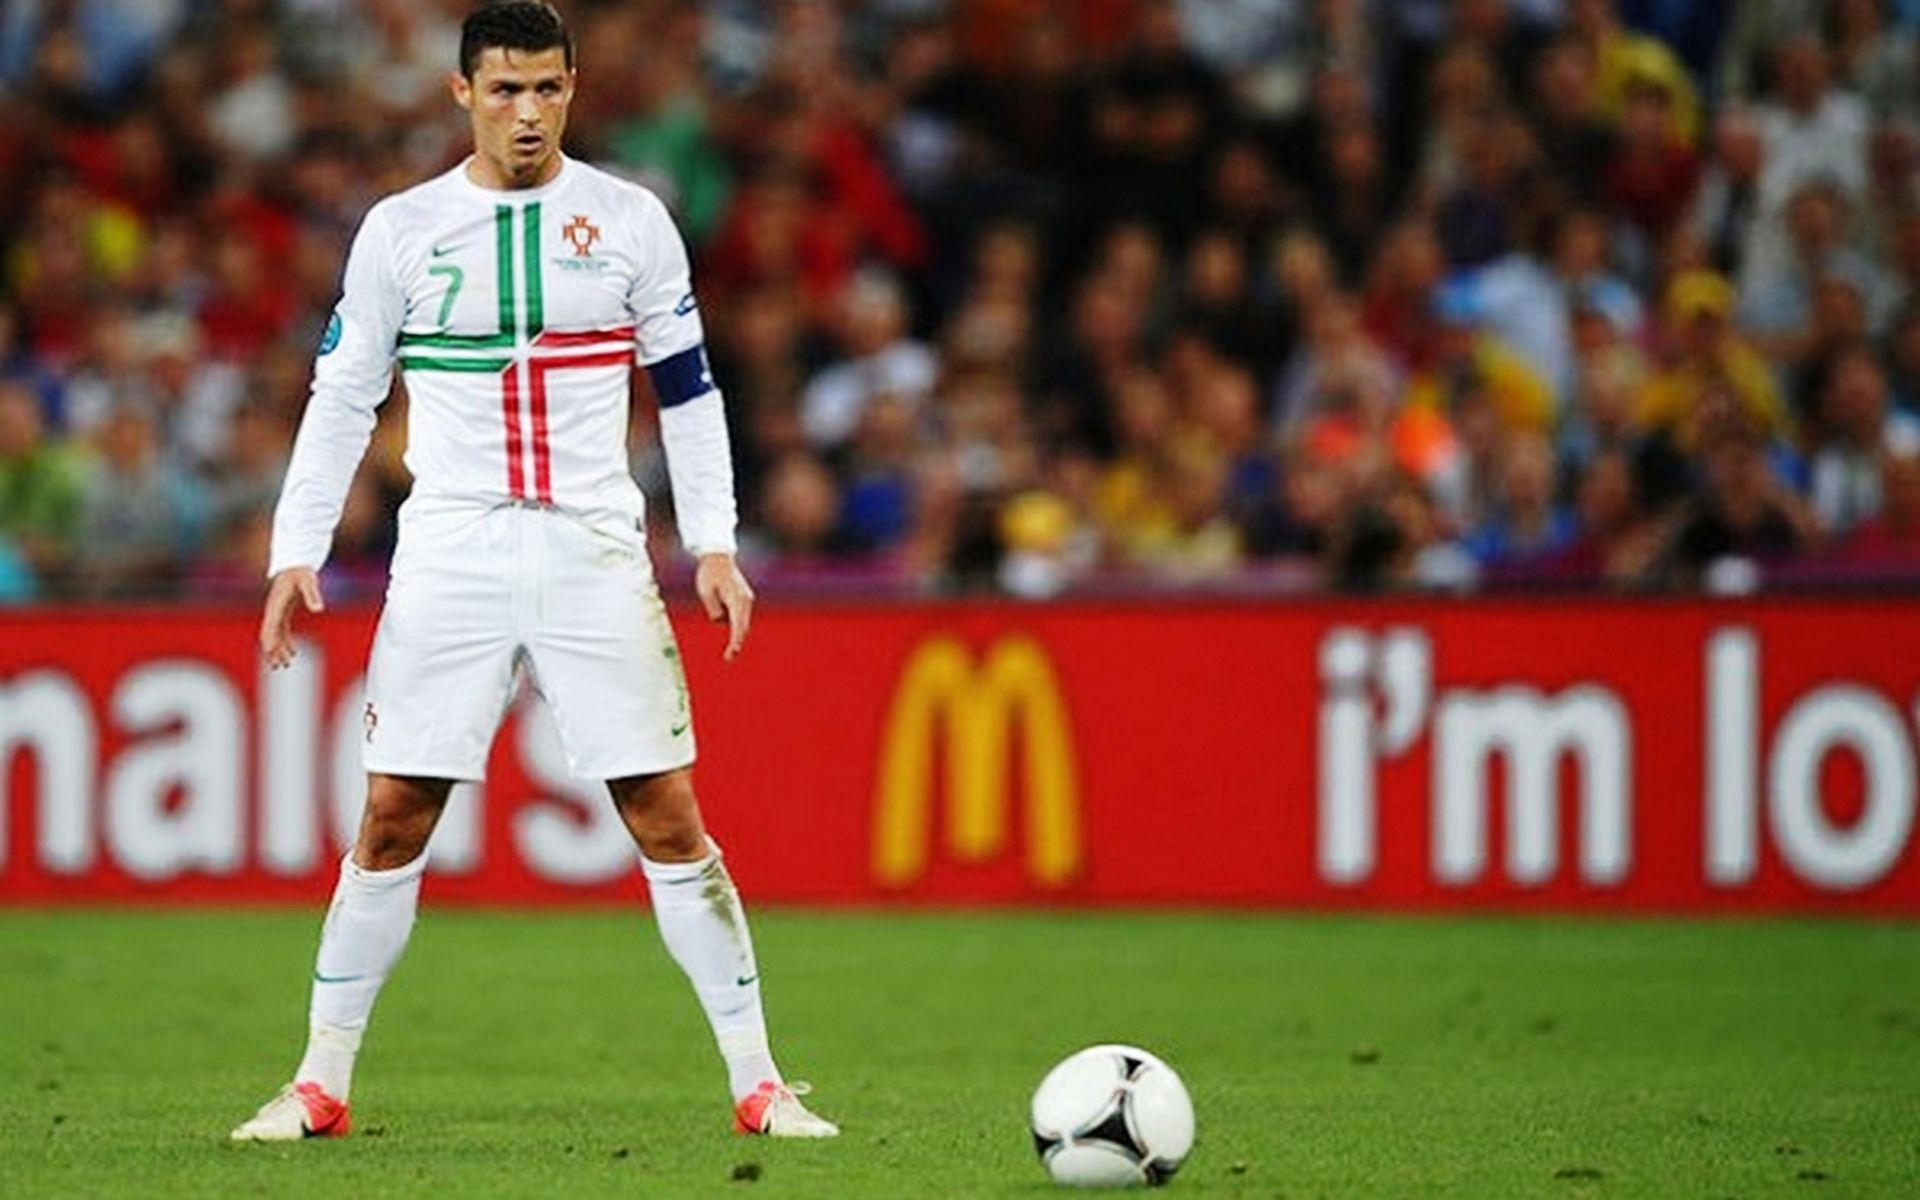 Ronaldo Free Kick Wallpaper Images P7A Ronaldo free